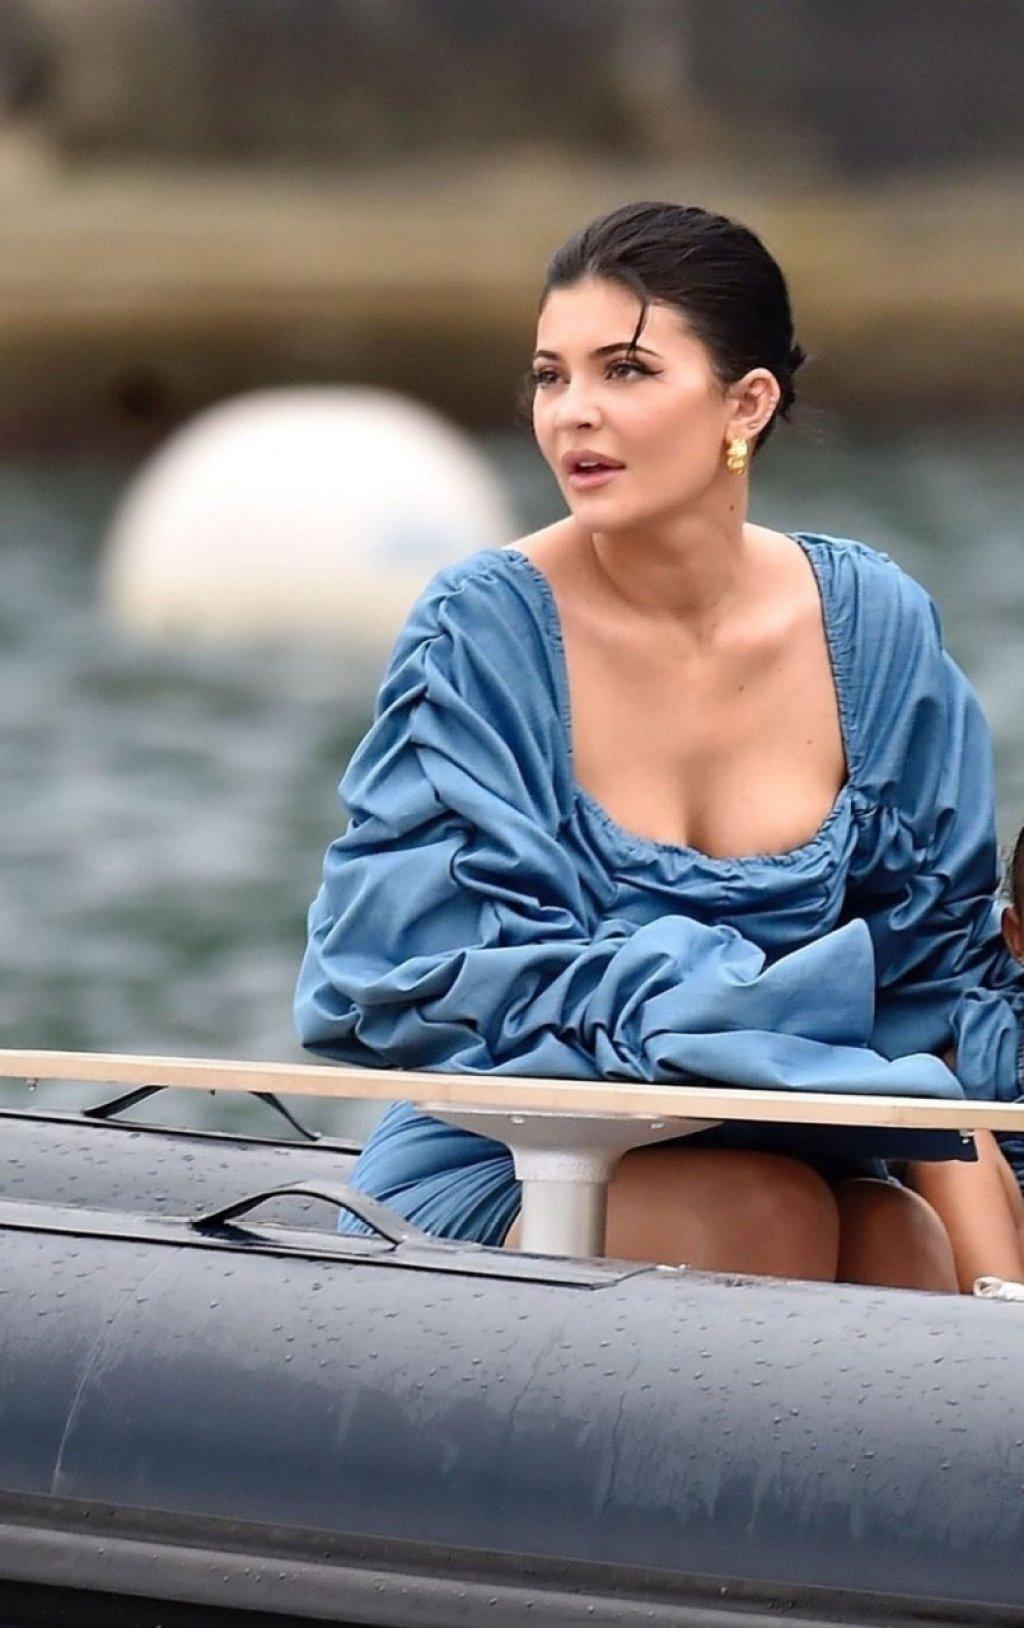 Kylie Jenner Sexy (25 Hot Photos)